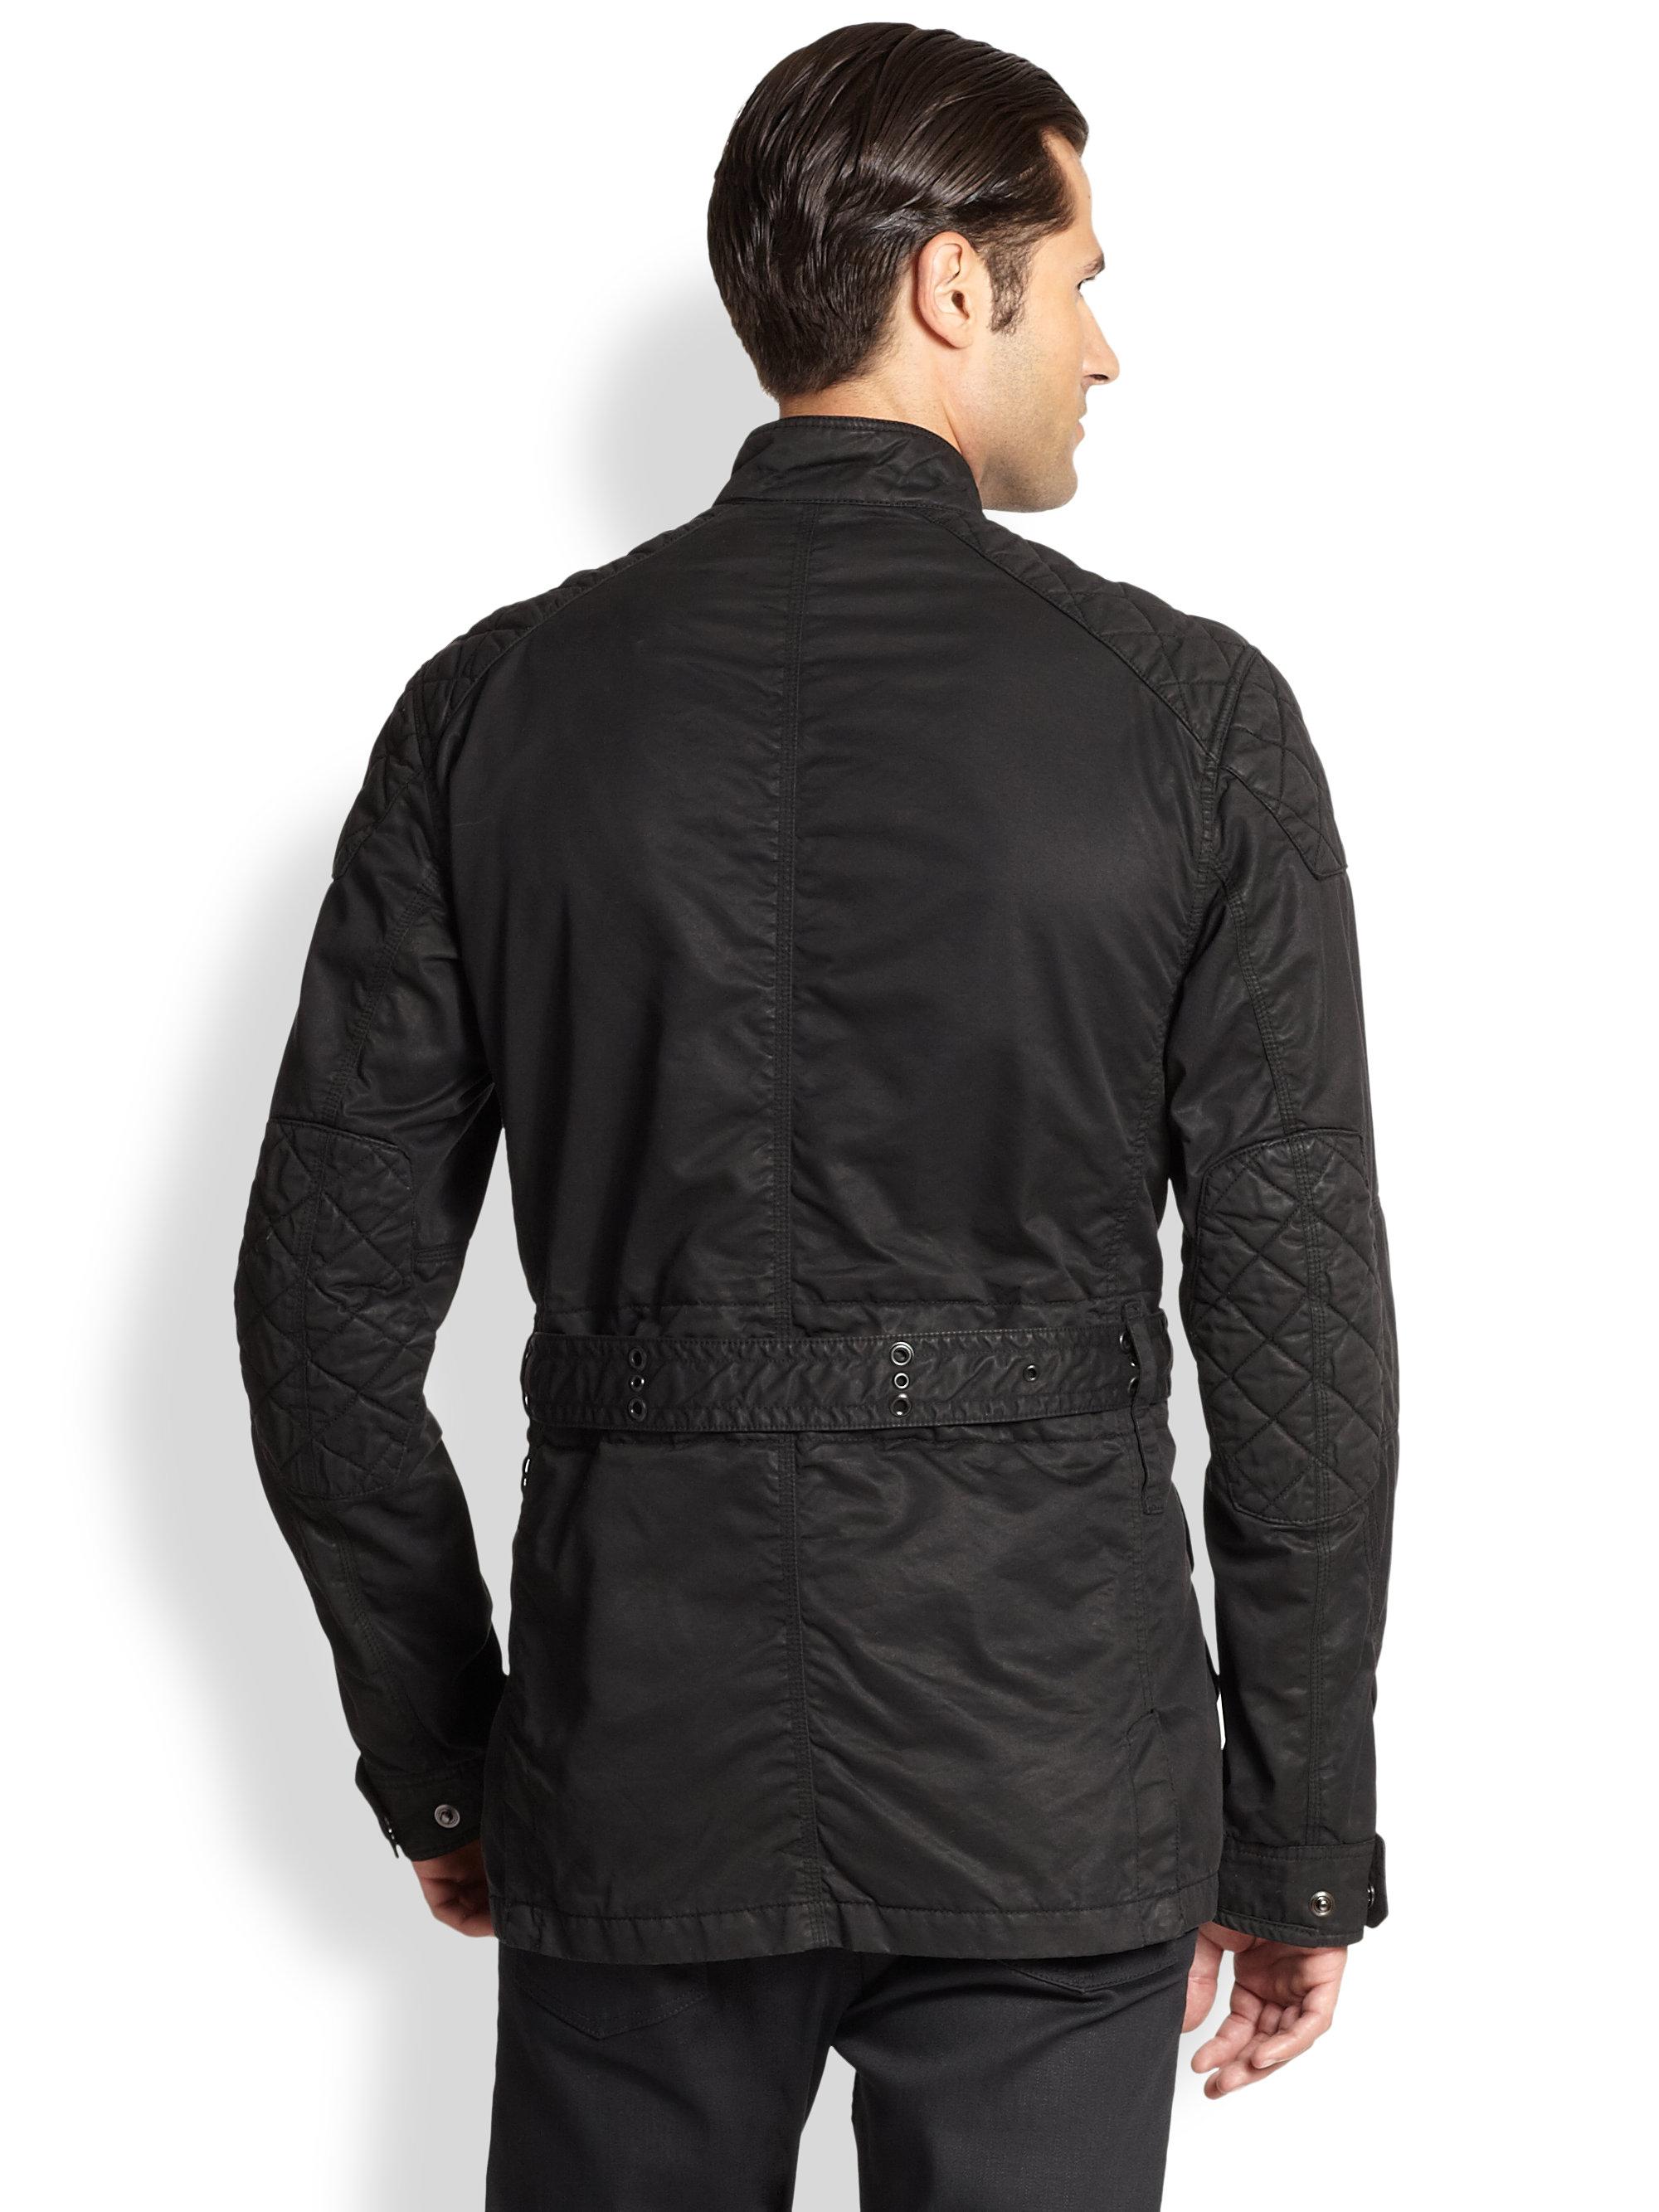 Ralph Lauren Black Label Suspension 4 Pocket Jacket In